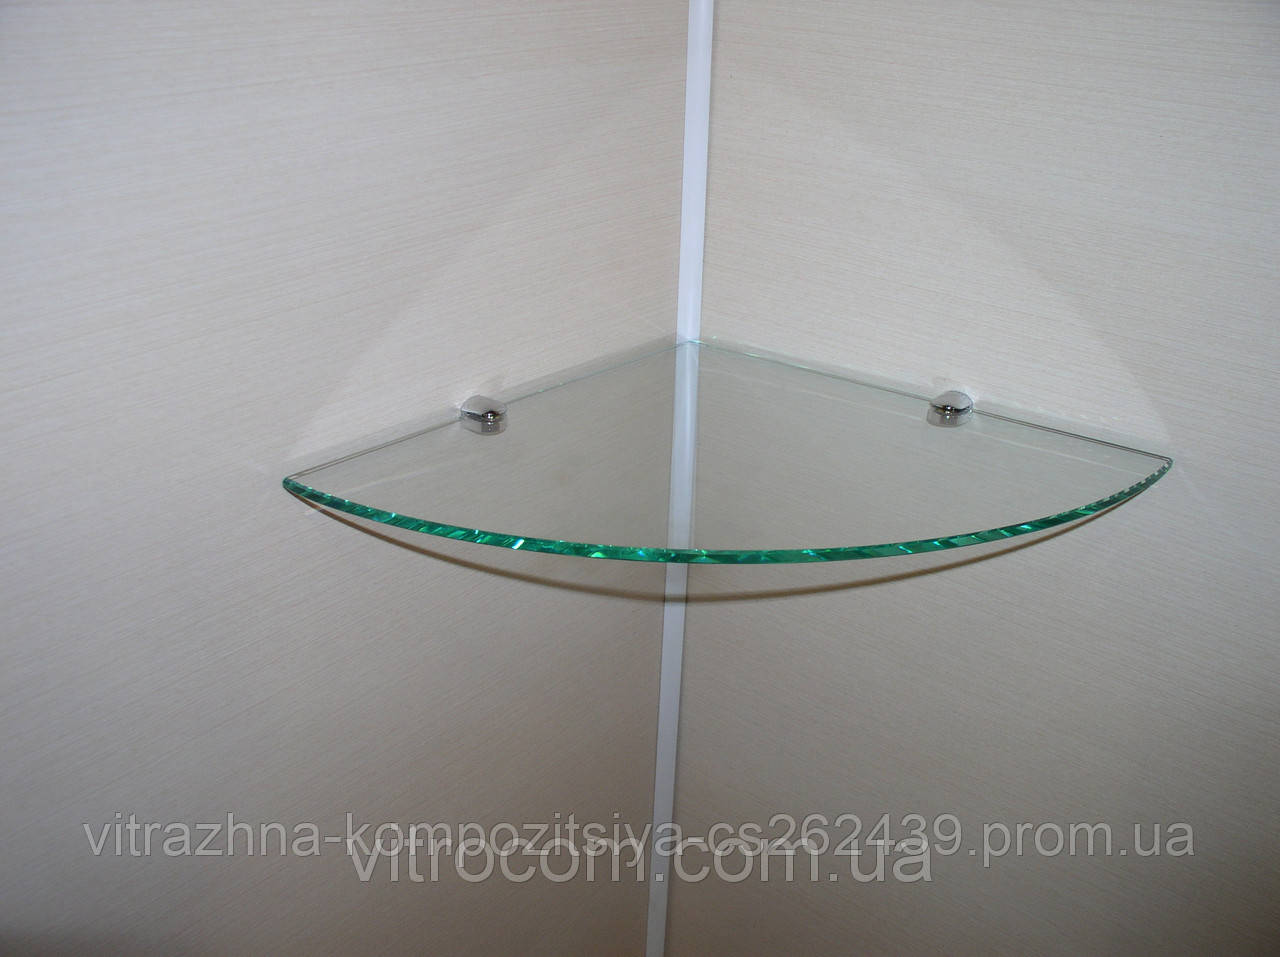 Полка стеклянная угловая 4 мм прозрачная 20 х 20 см